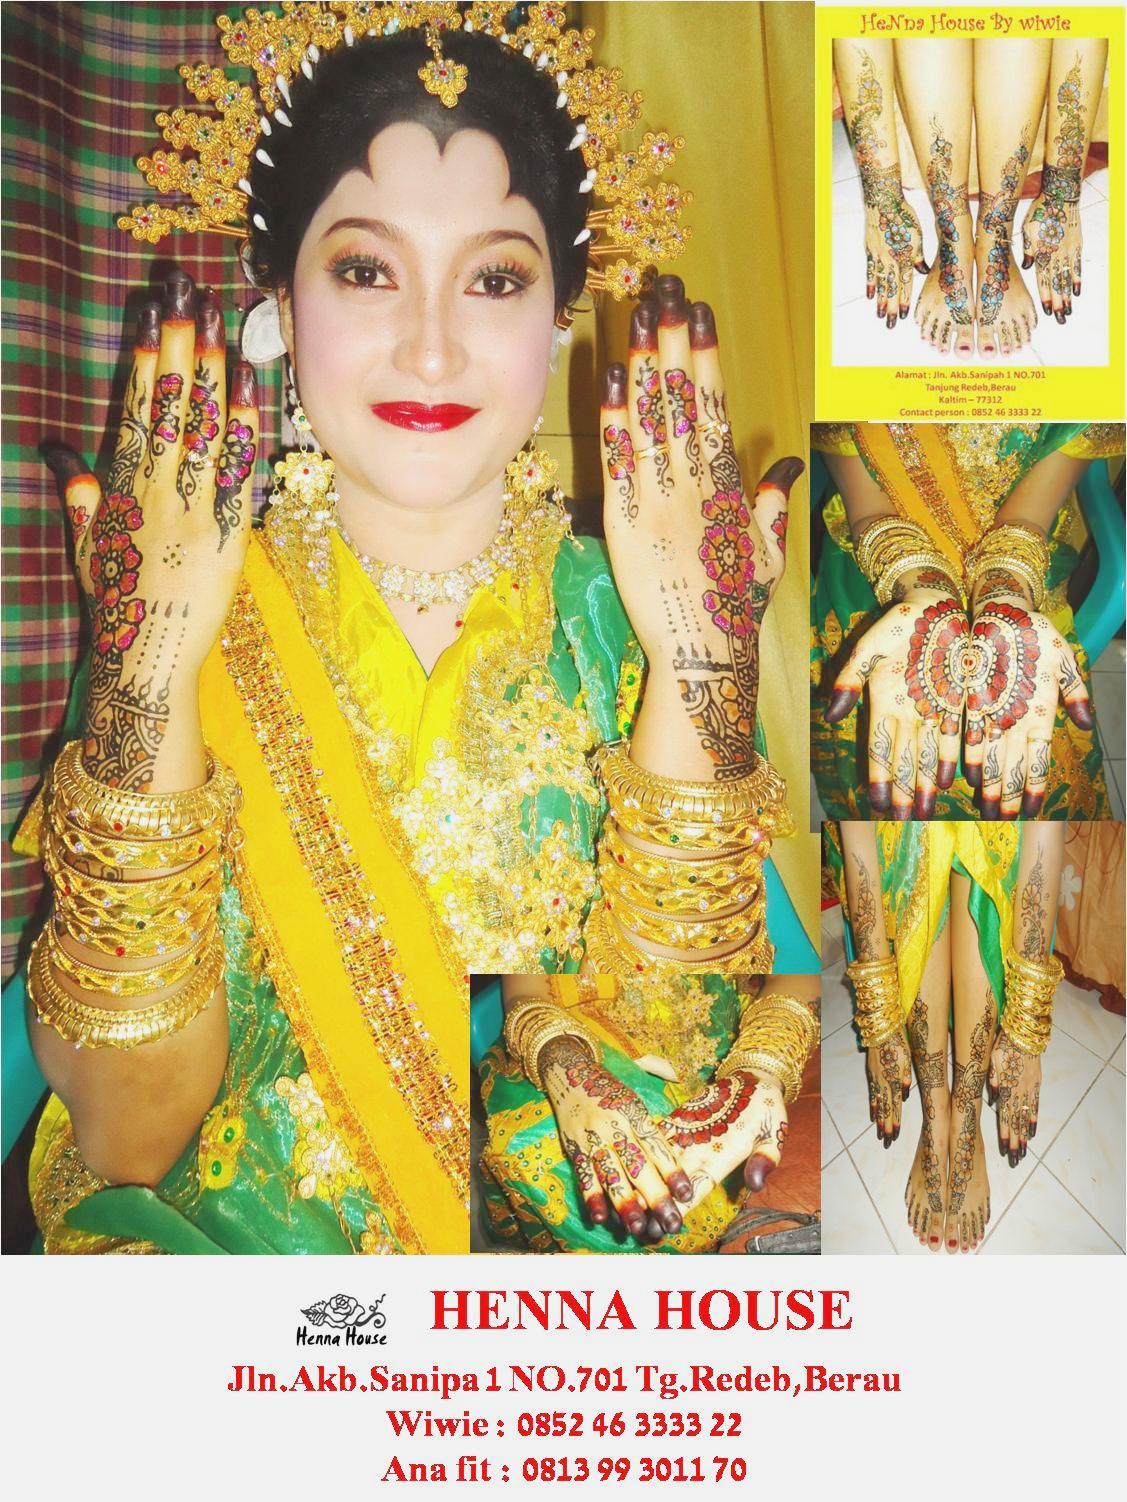 Henna House By Wiwie 01 03 12